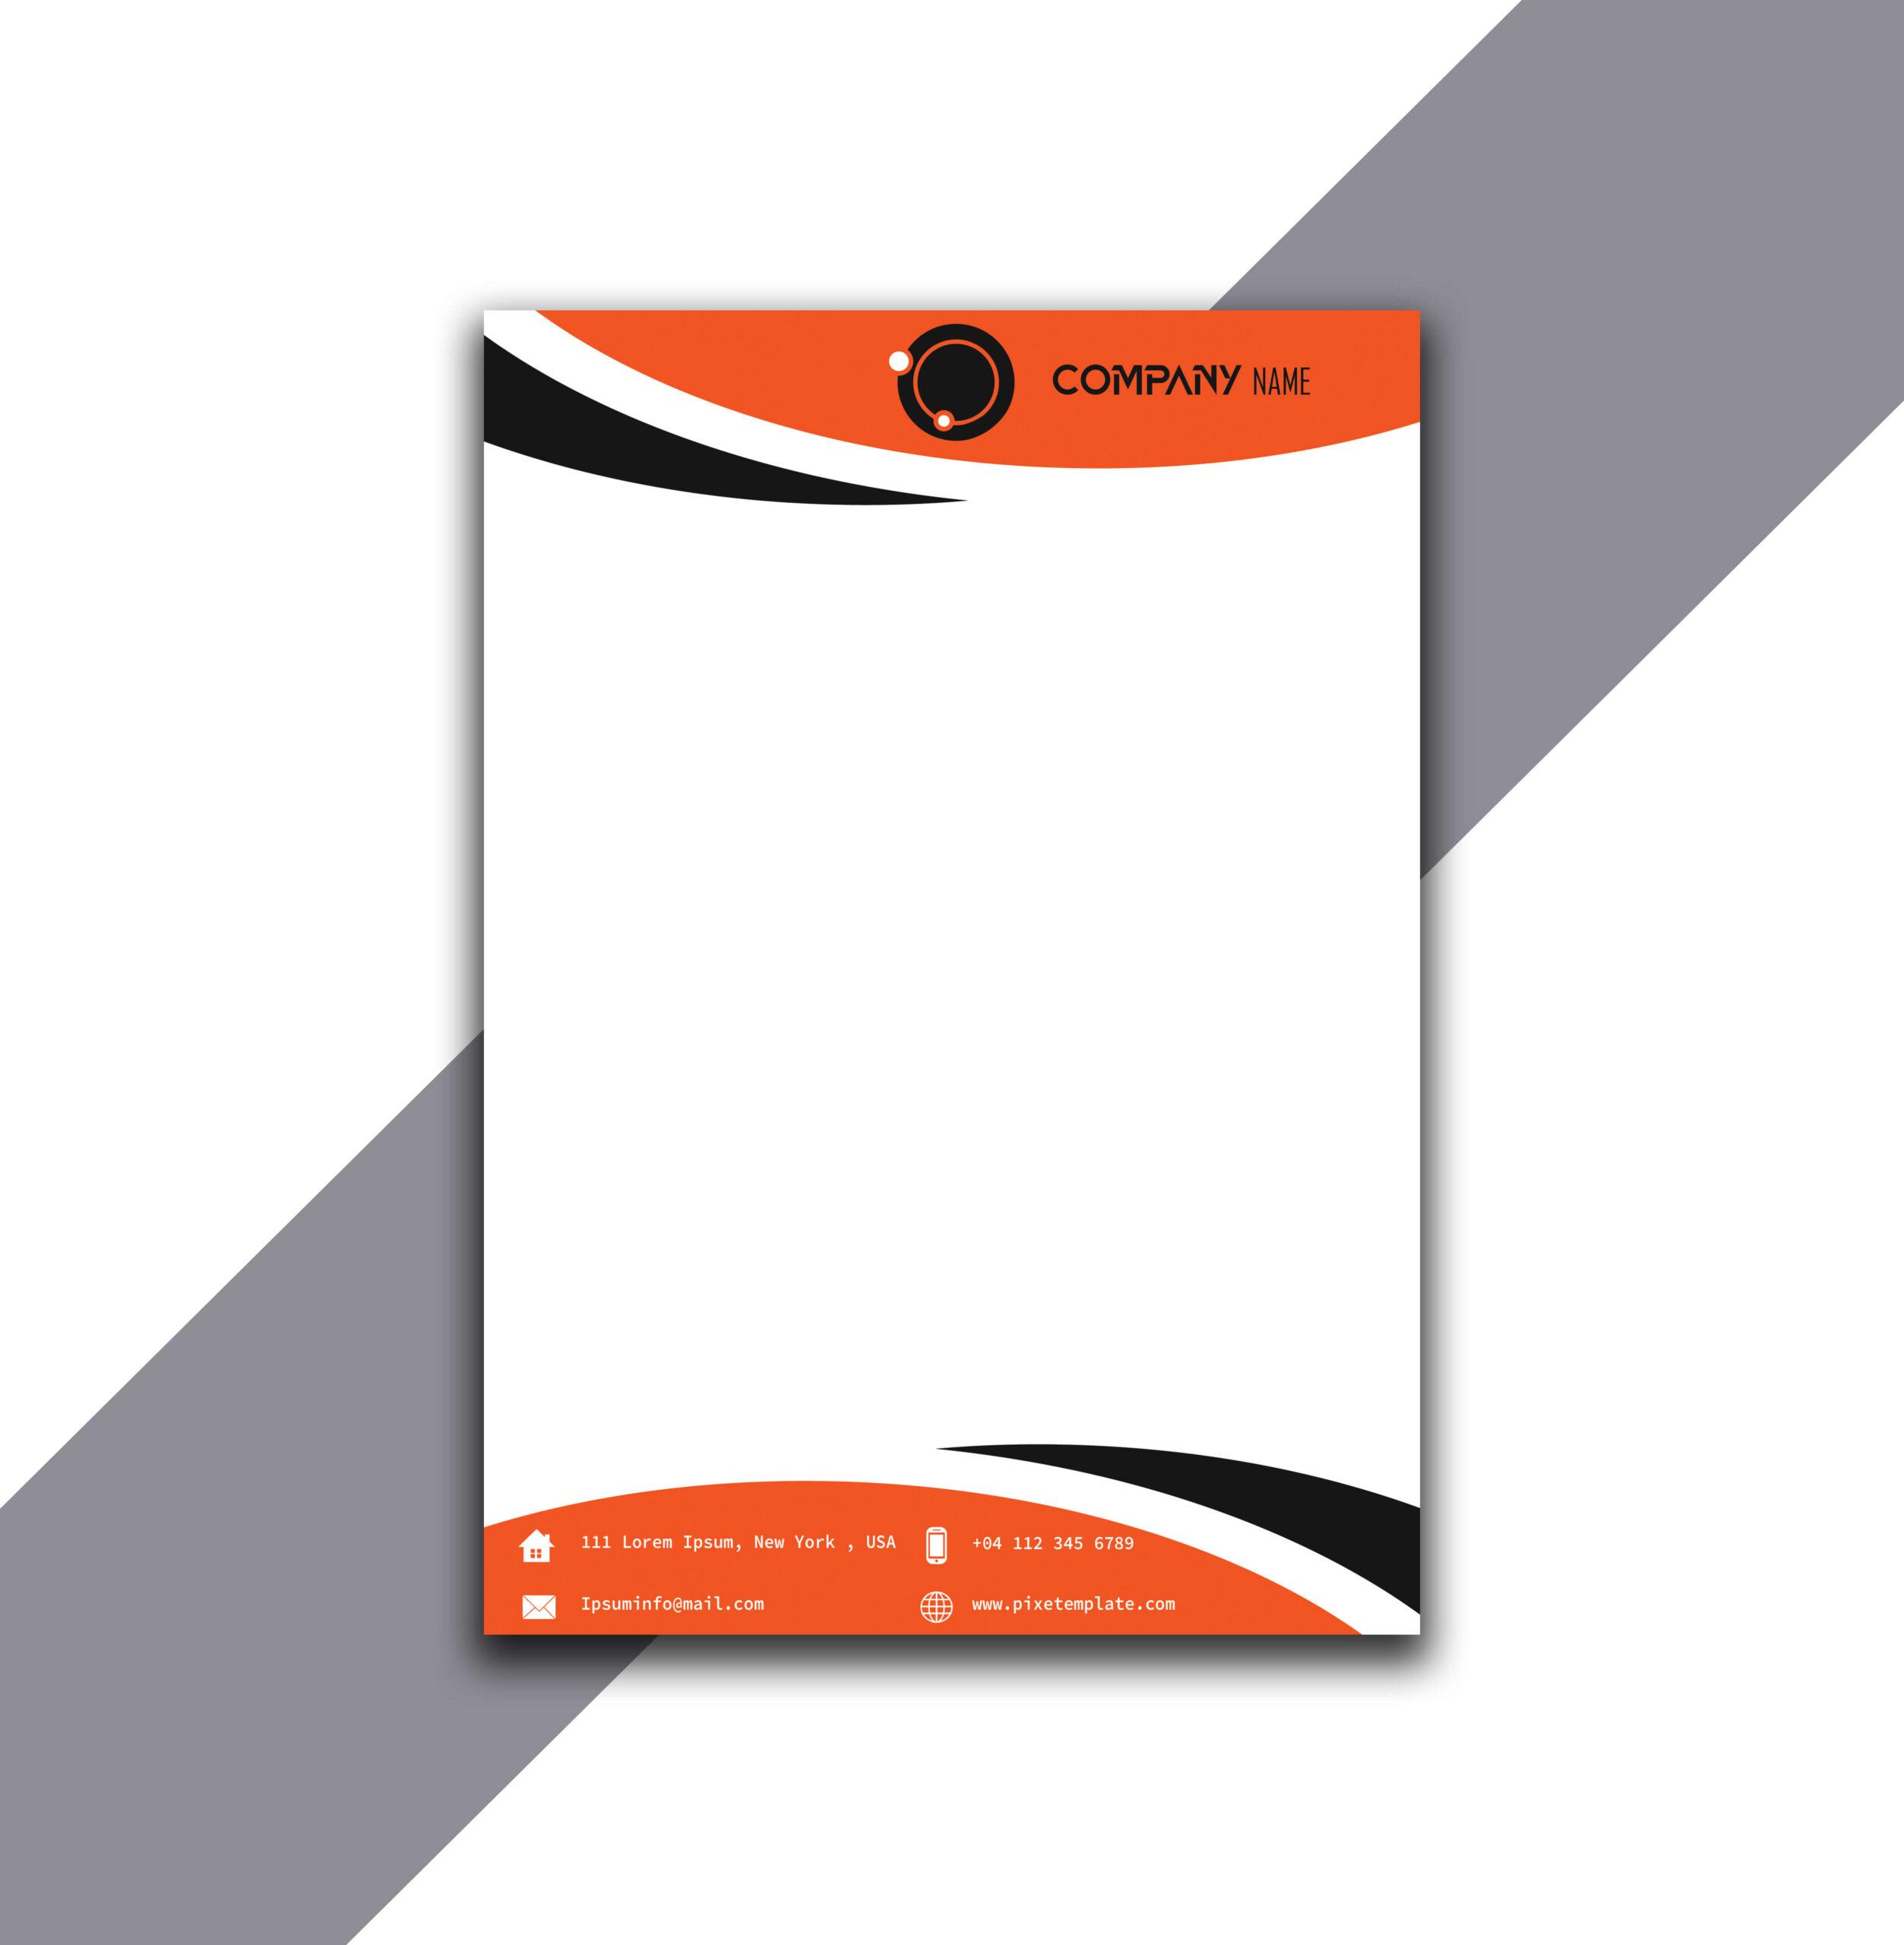 Orange and Black Curvy Letterhead Design in Illustrator